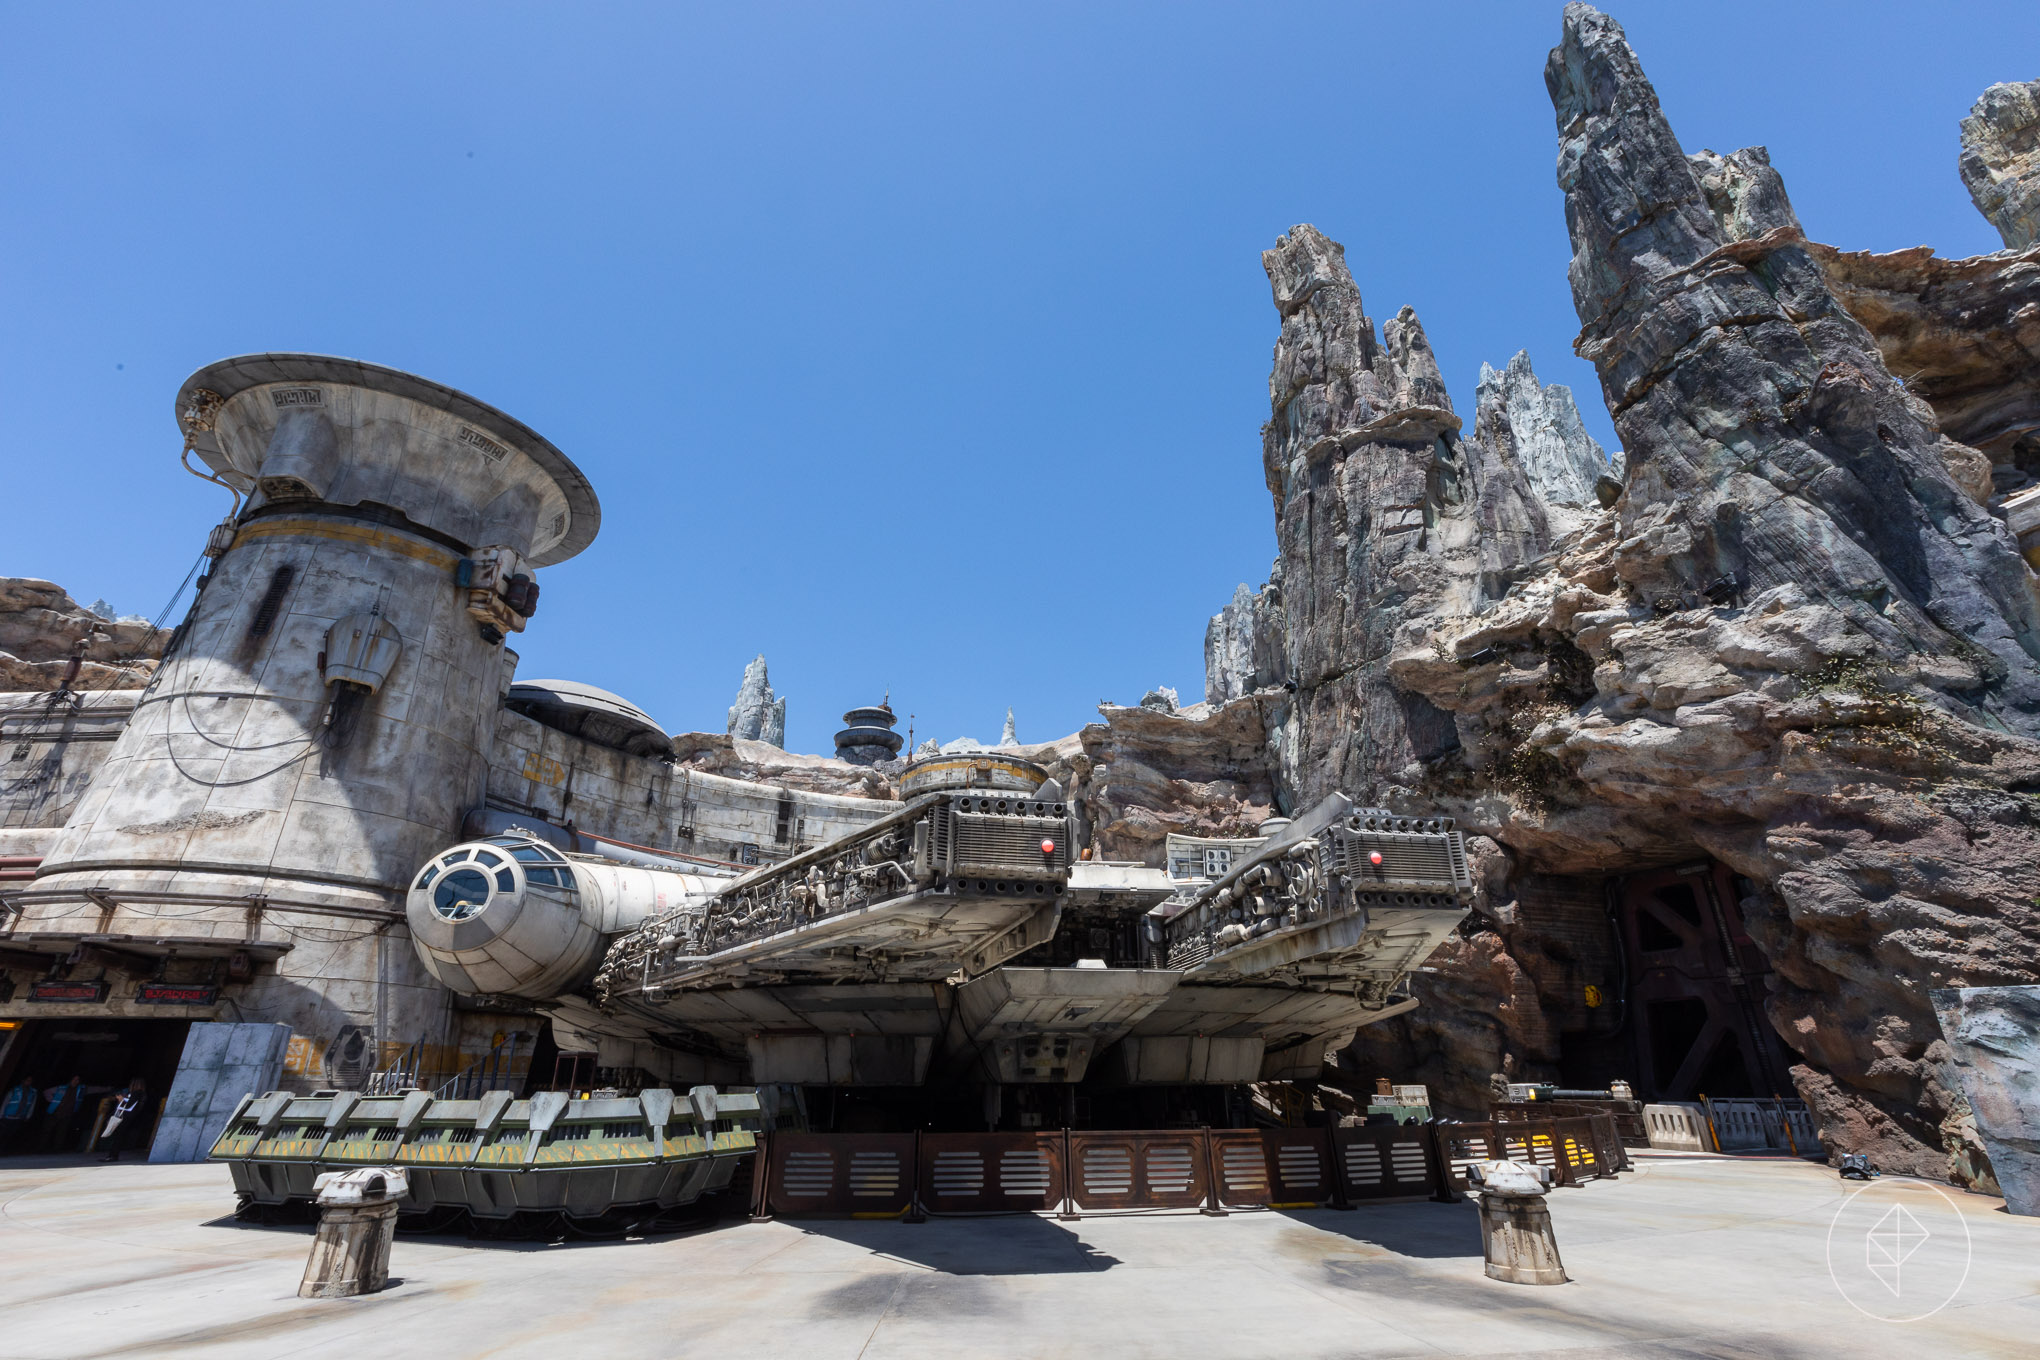 Disneyland's Galaxy's Edge.